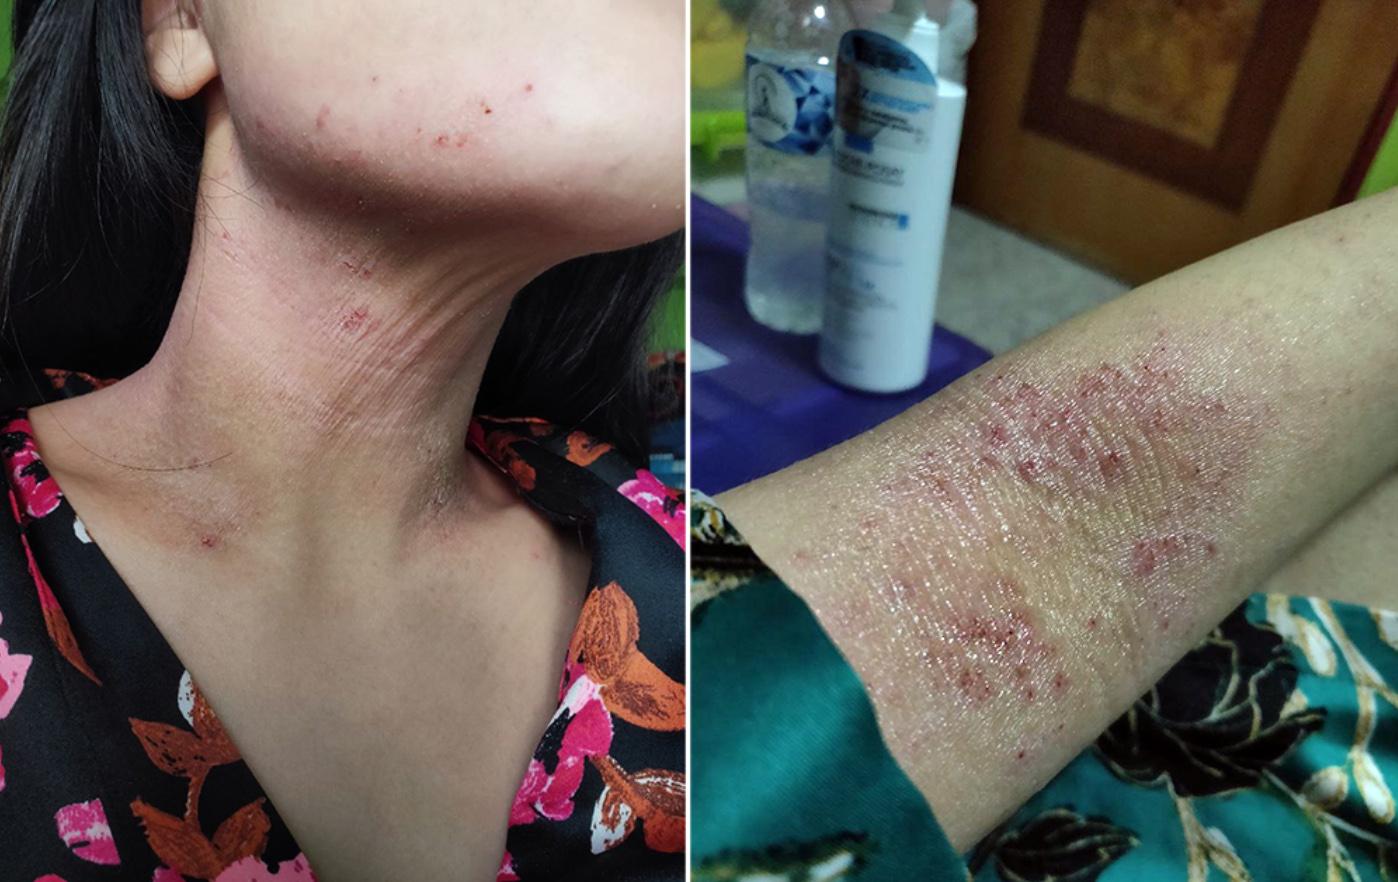 Eczema in Singapore - Neck and Elbow Rash